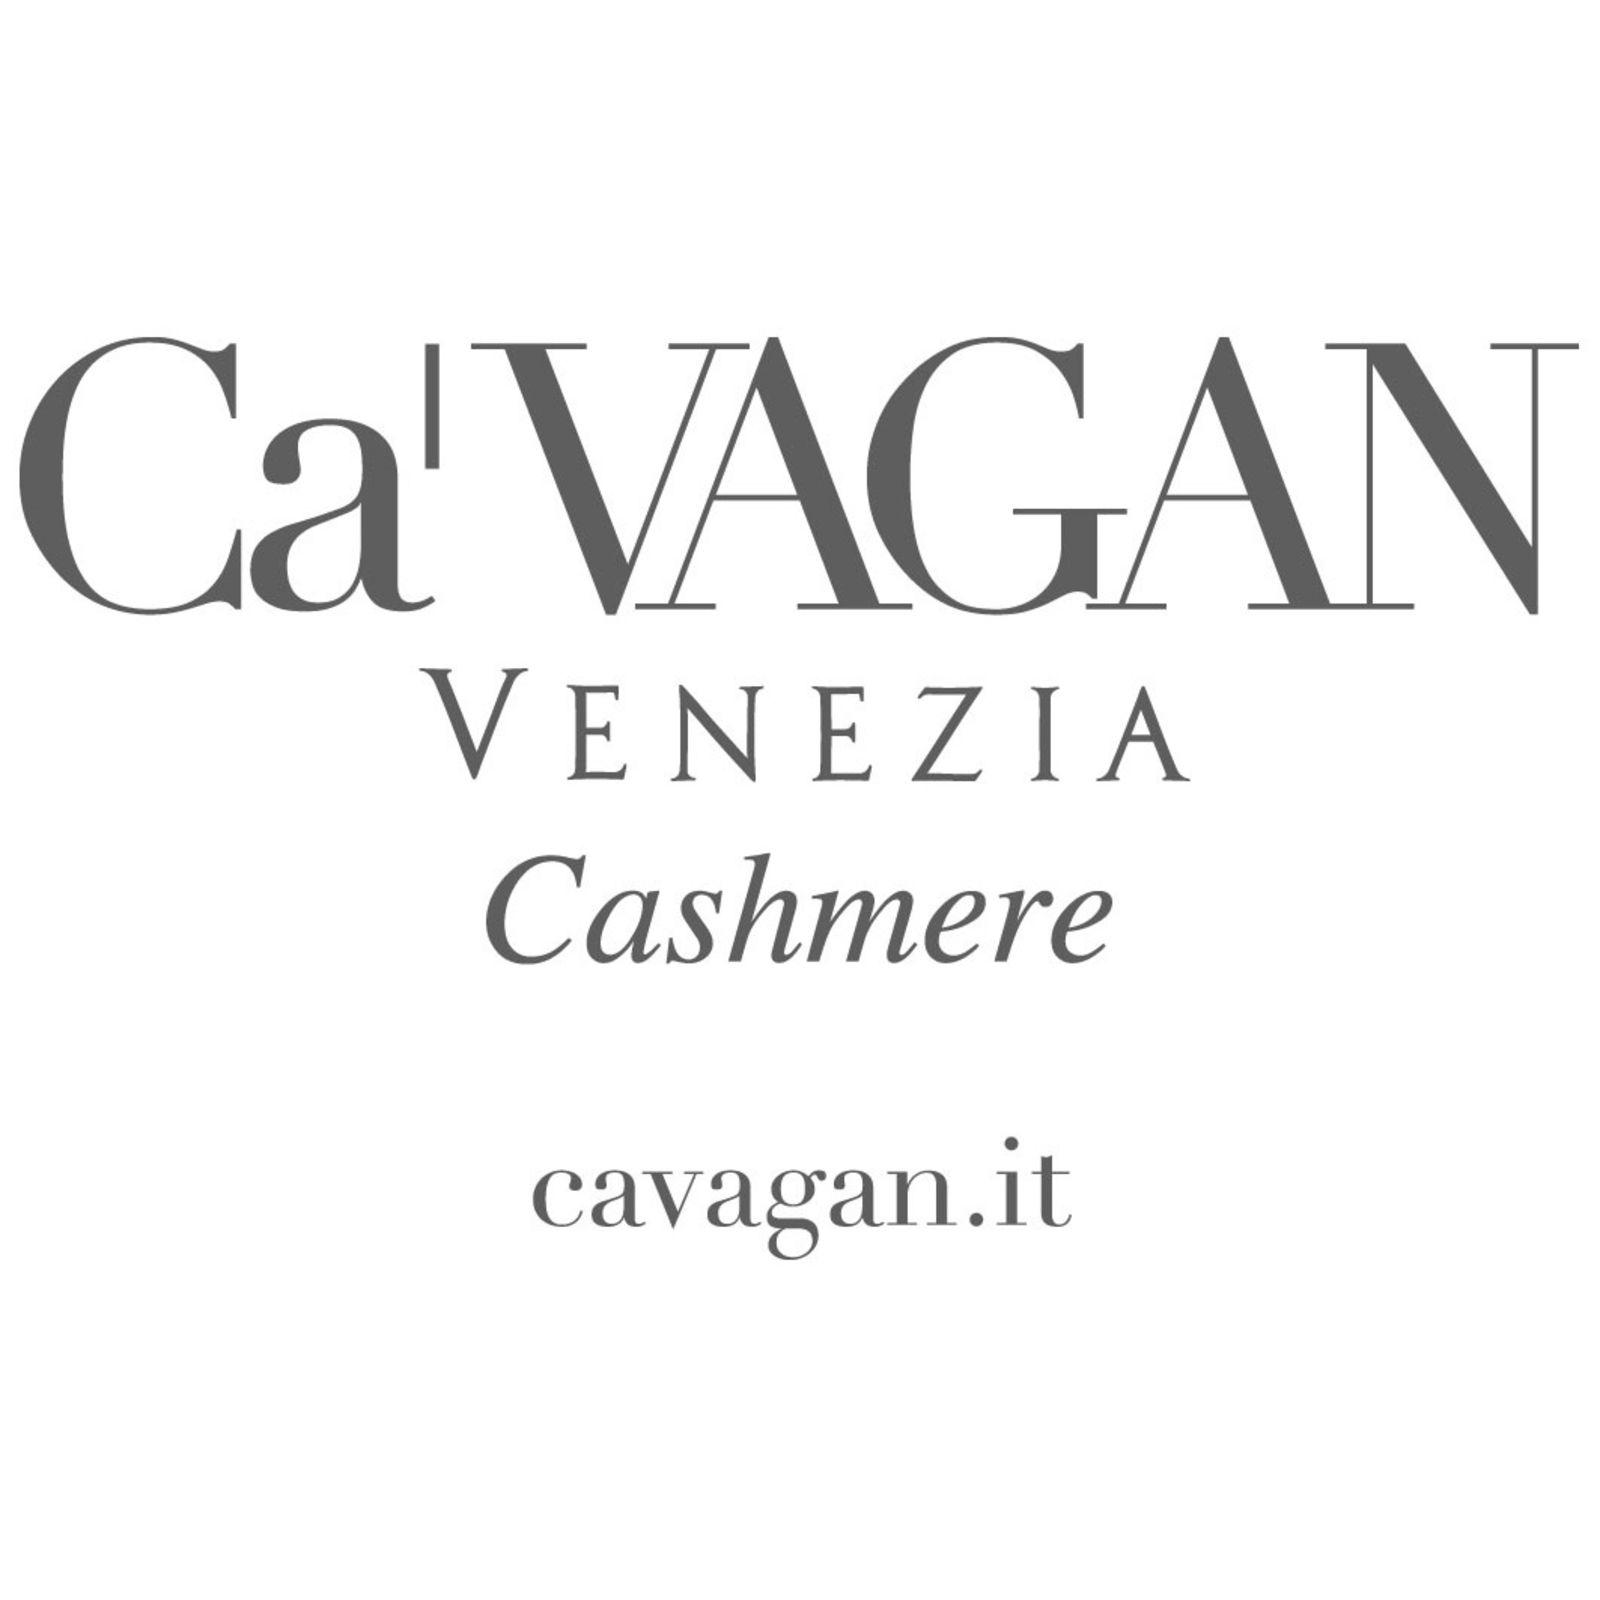 Ca'VAGAN VENEZIA cashmere